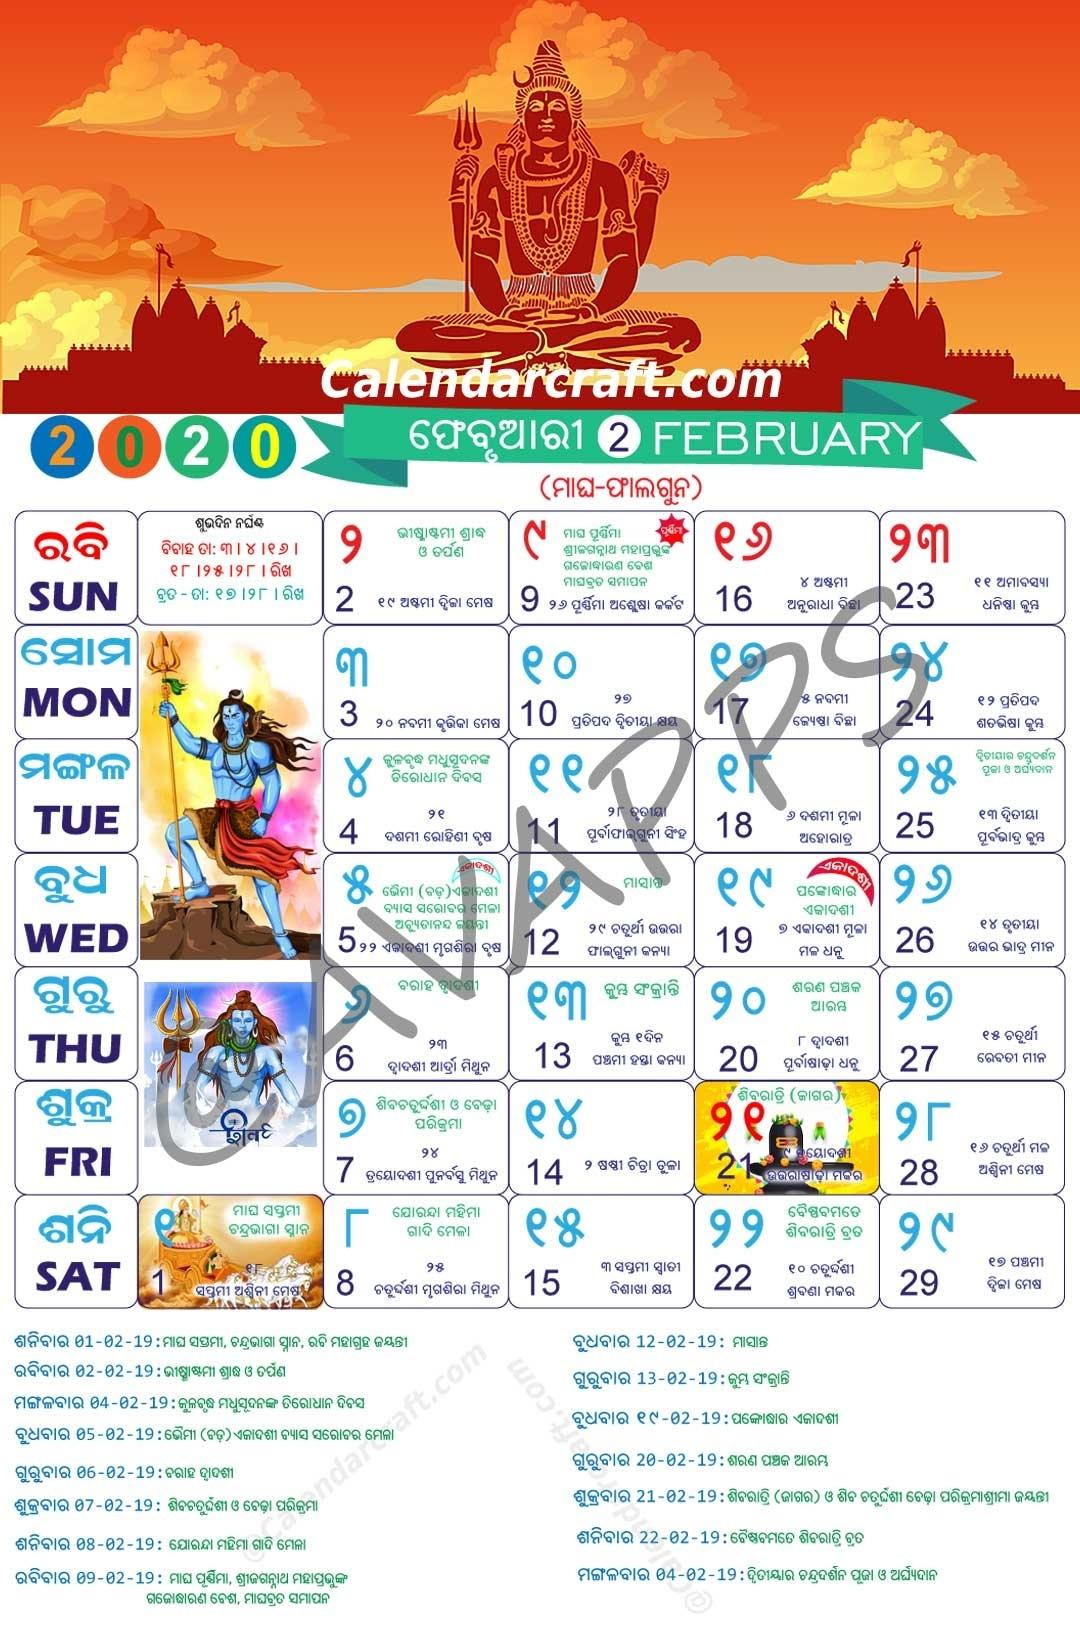 February 2020 Odia Calendar | Calendar Template Information regarding Oriya Calendar 2020 February